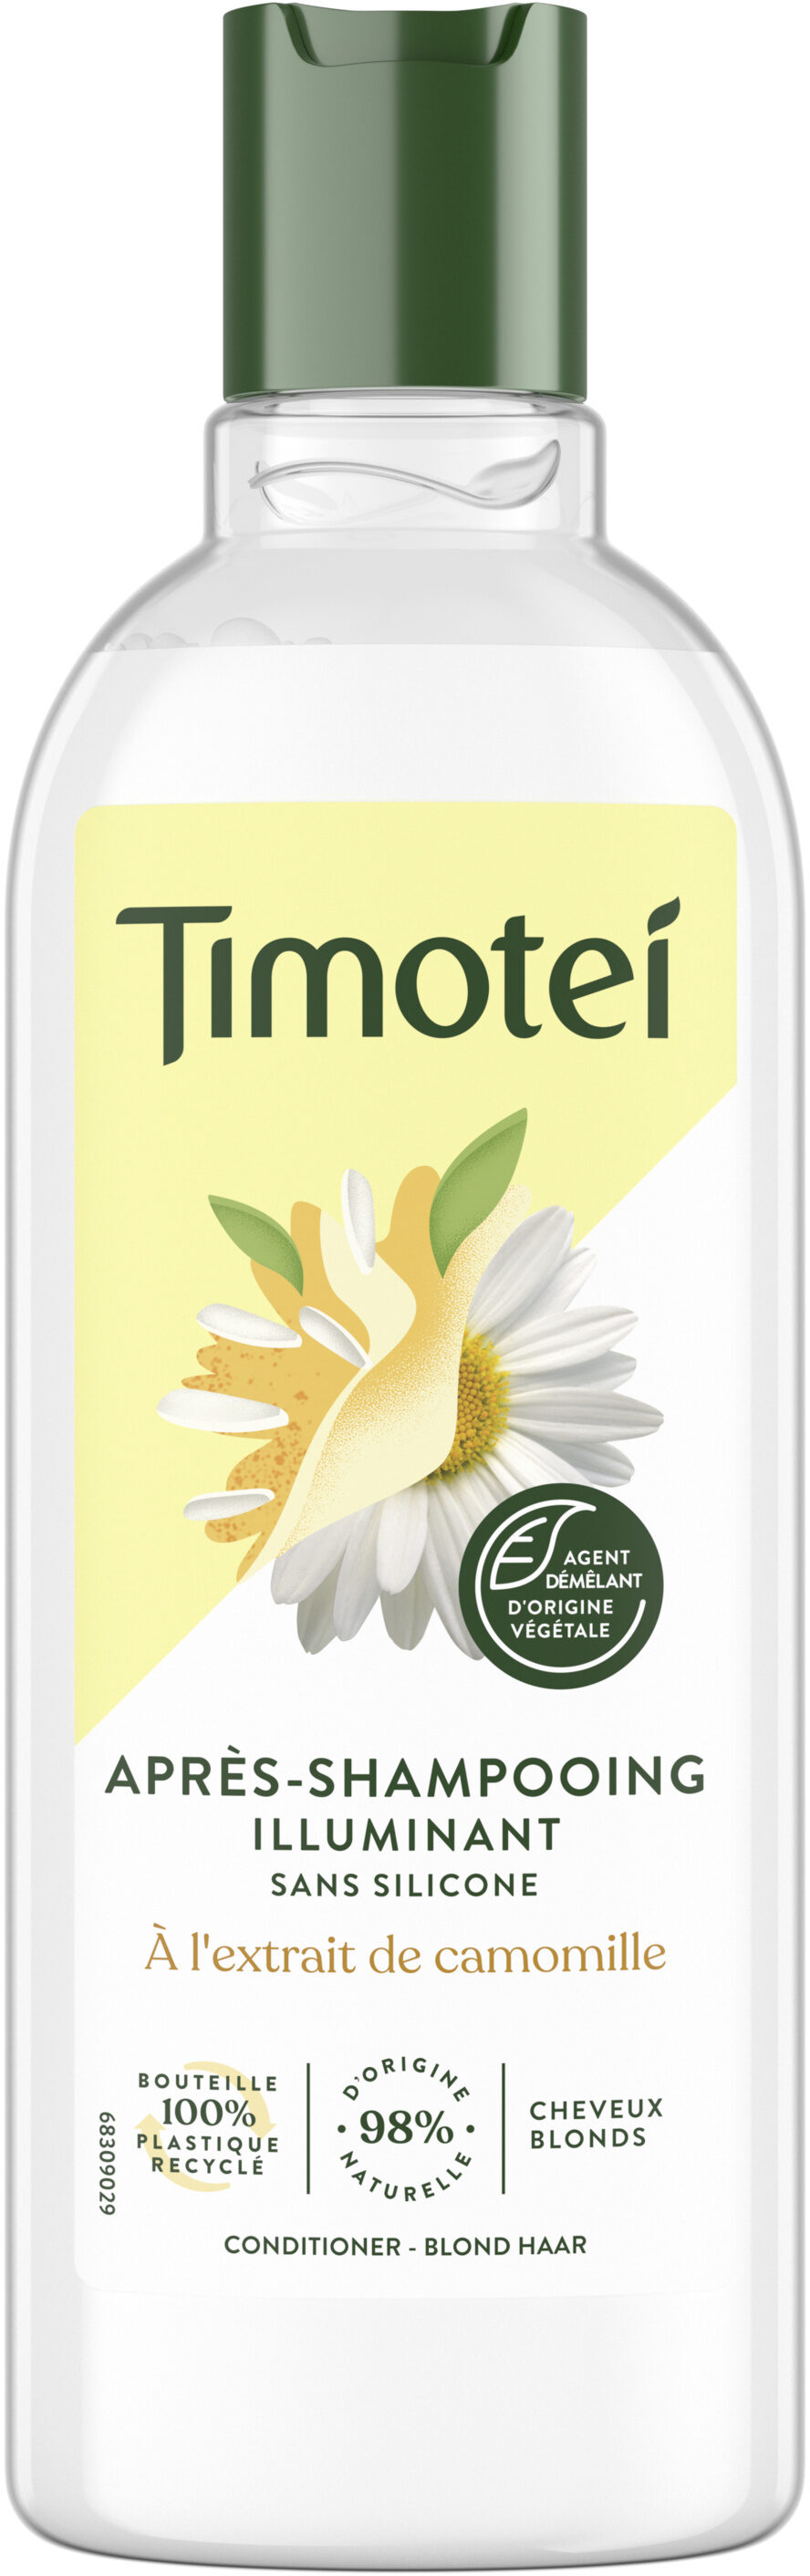 Timotei Après-Shampooing Femme Illuminant - Produit - fr